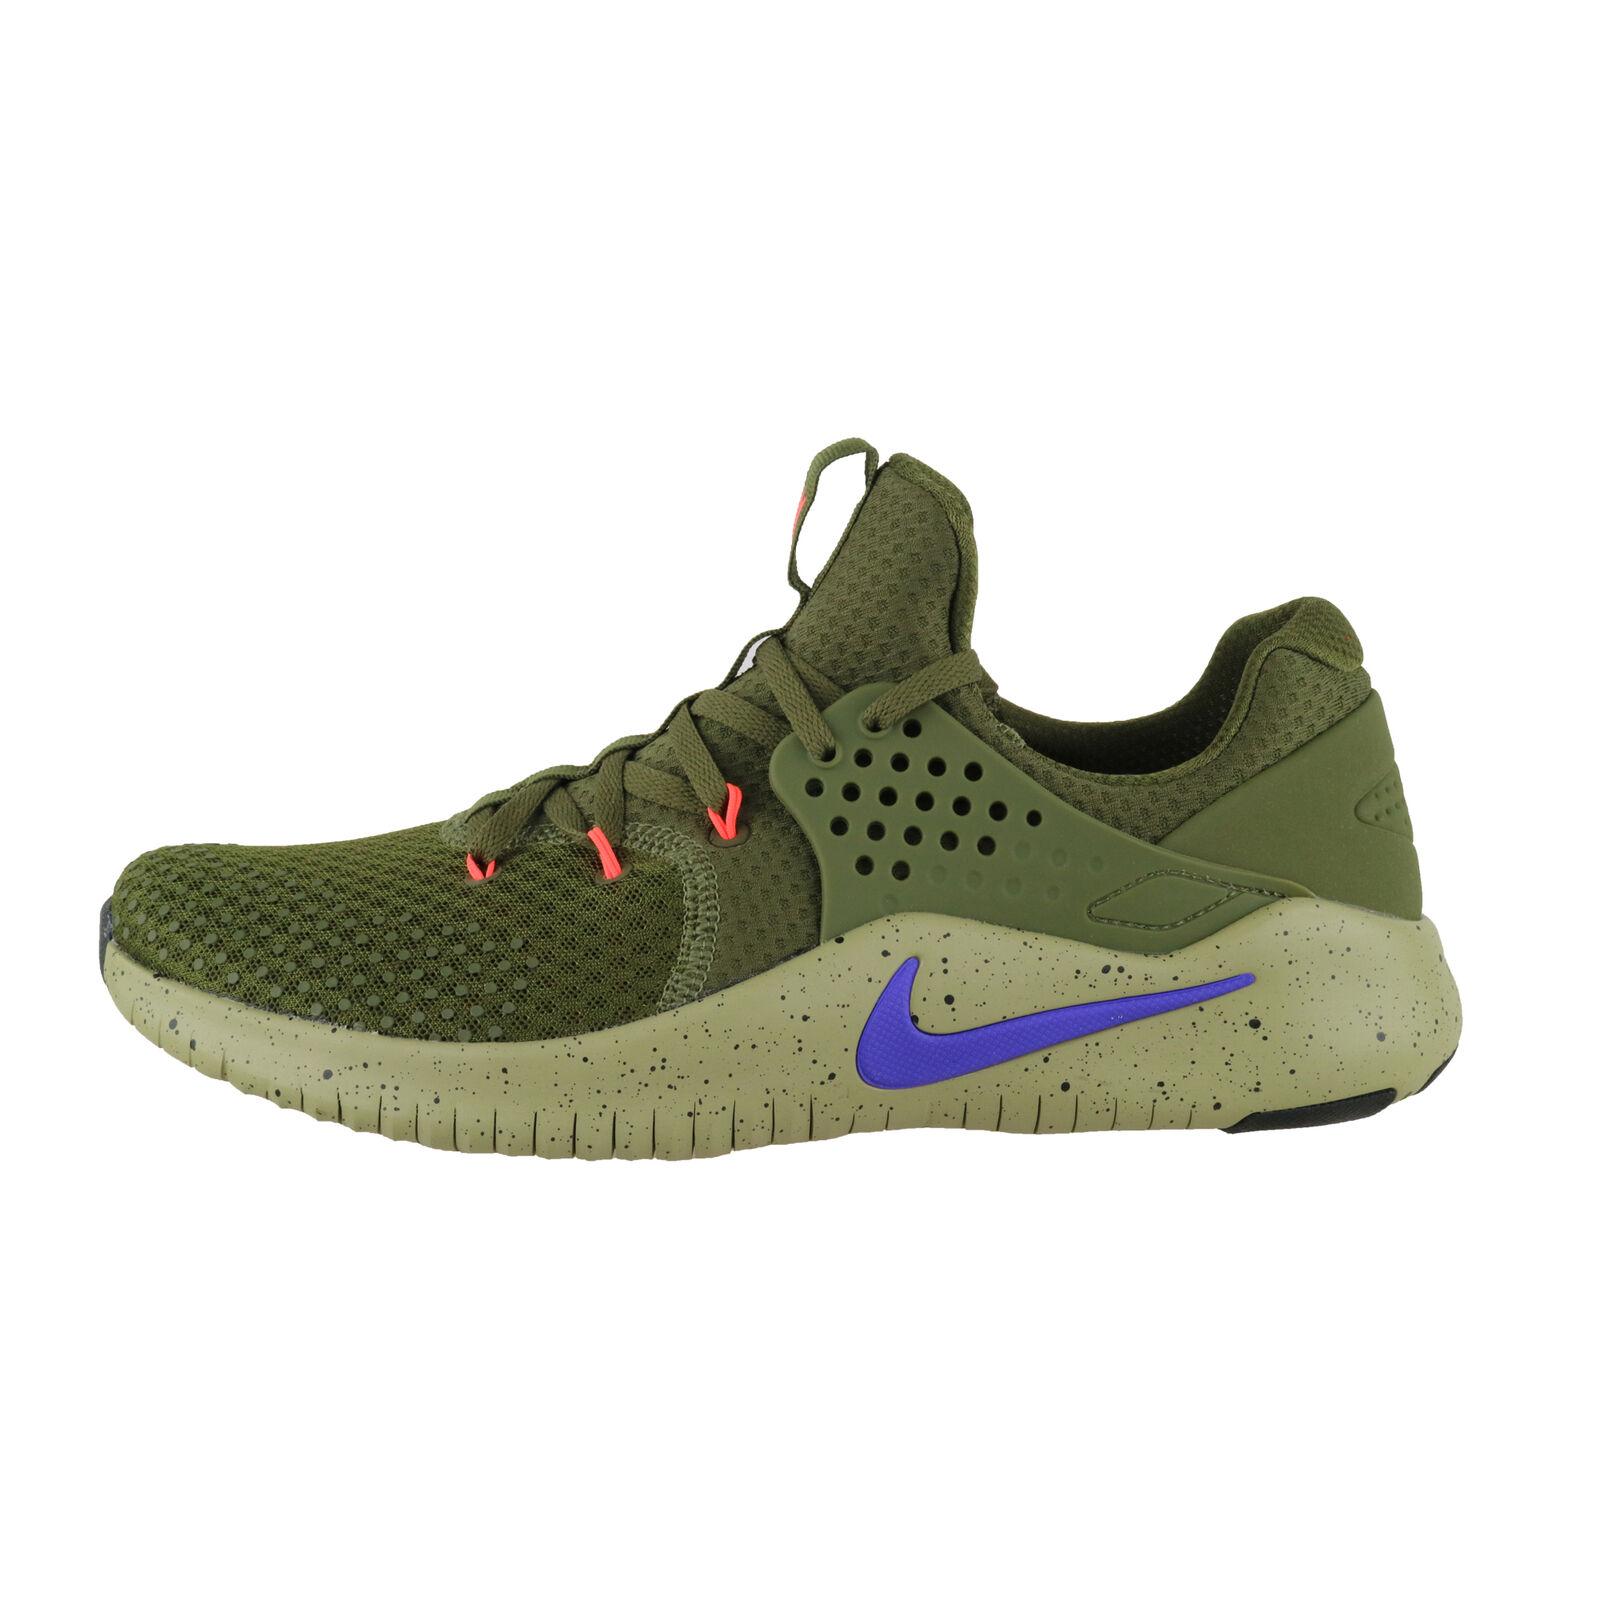 Nike Free TR v8 verde oliva-training entrenador de zapatos ah9395-342